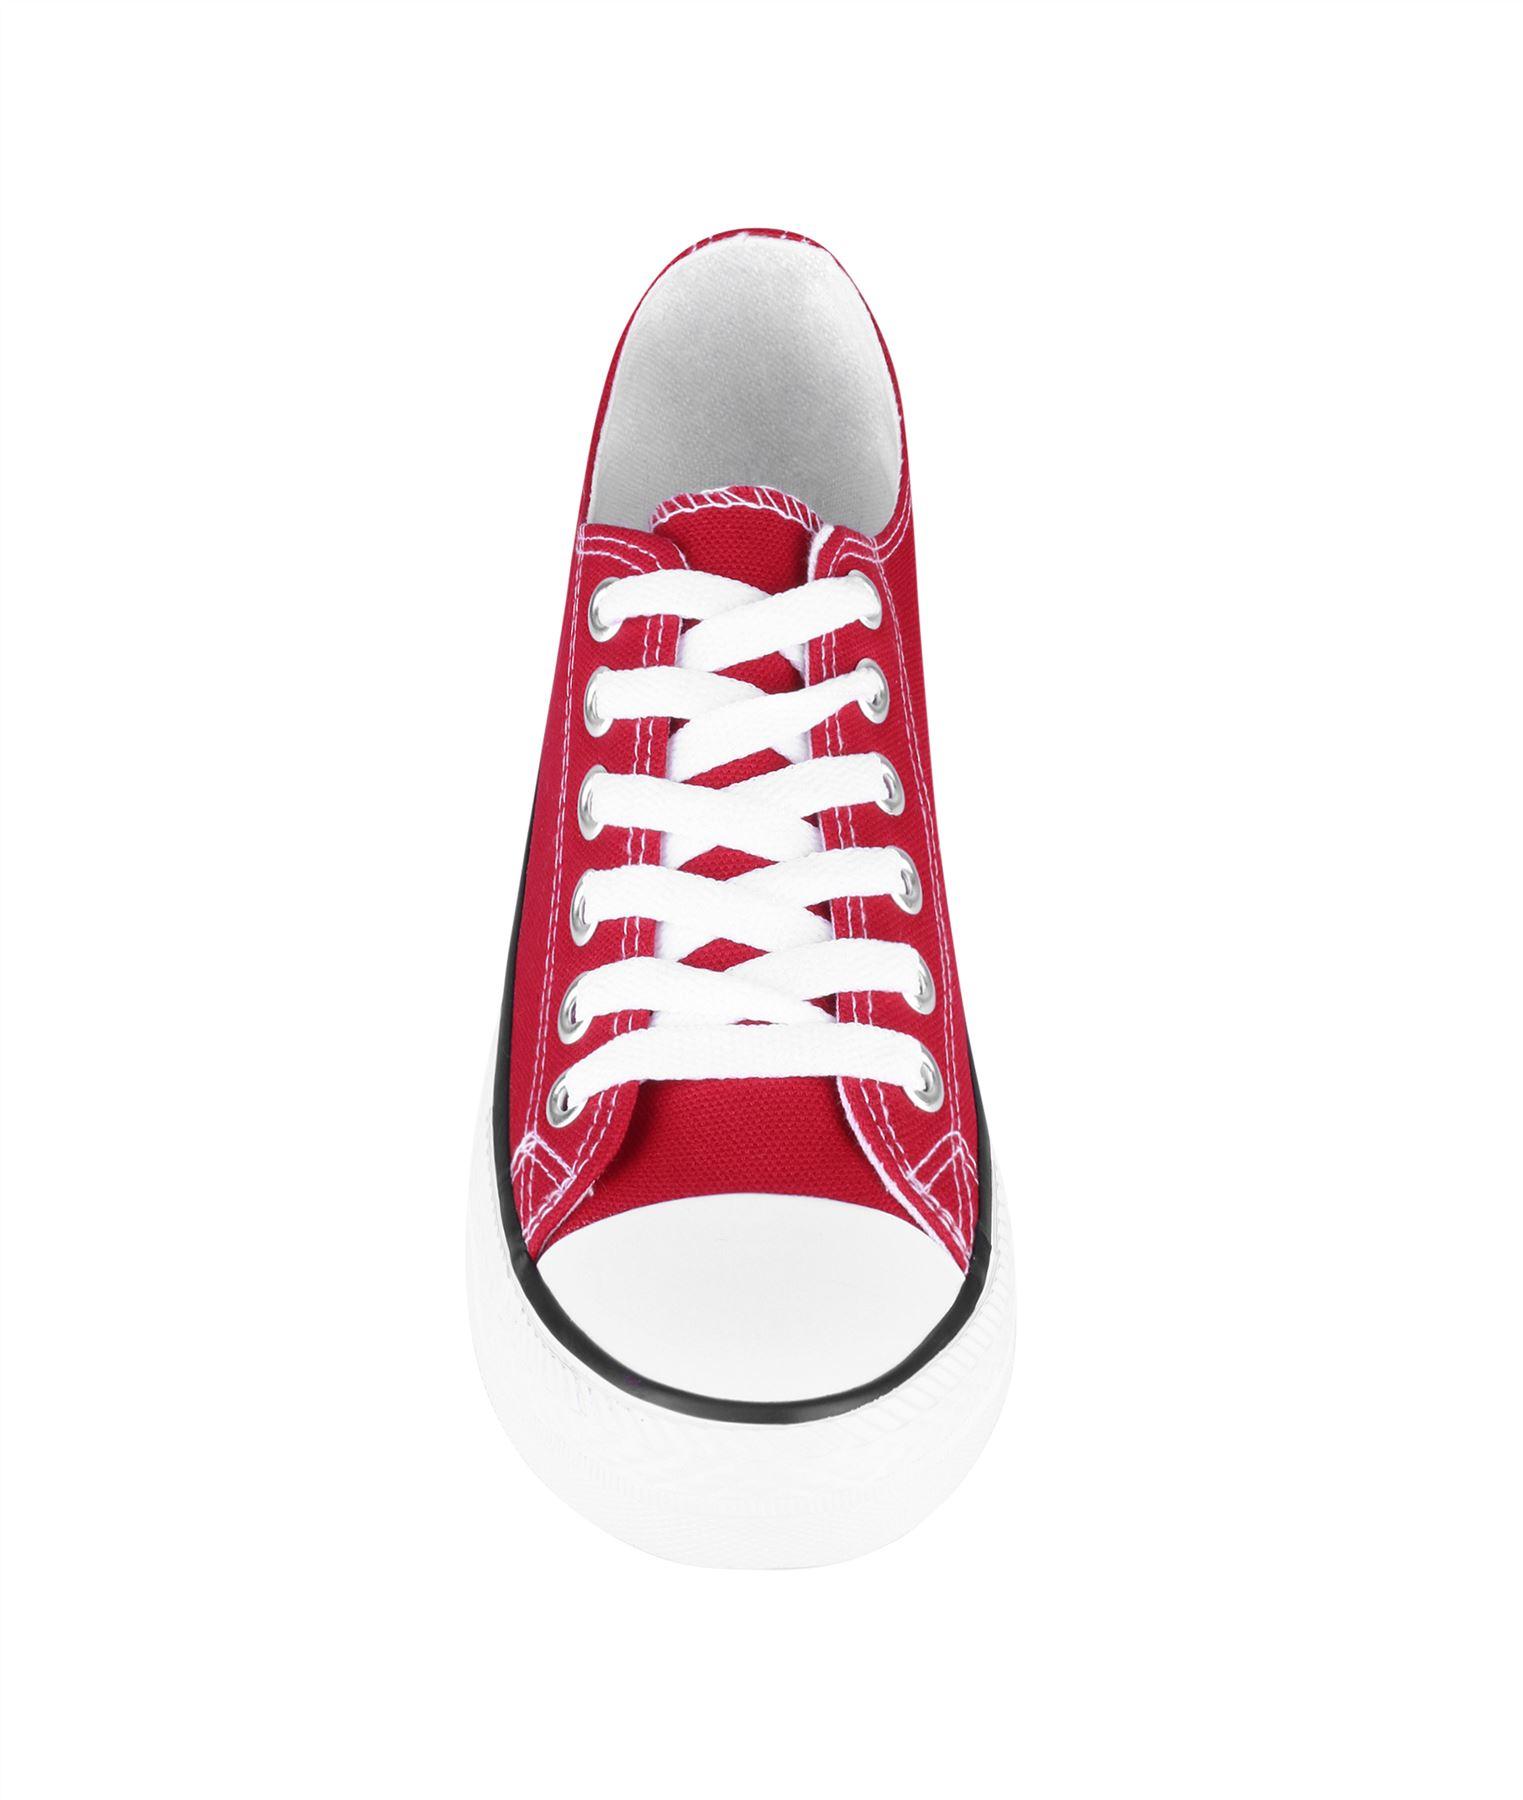 Zapatillas-Mujer-Casuales-Deportiva-Barata-Lona-Moda-Originales-Outlet-Tela-Moda miniatura 38